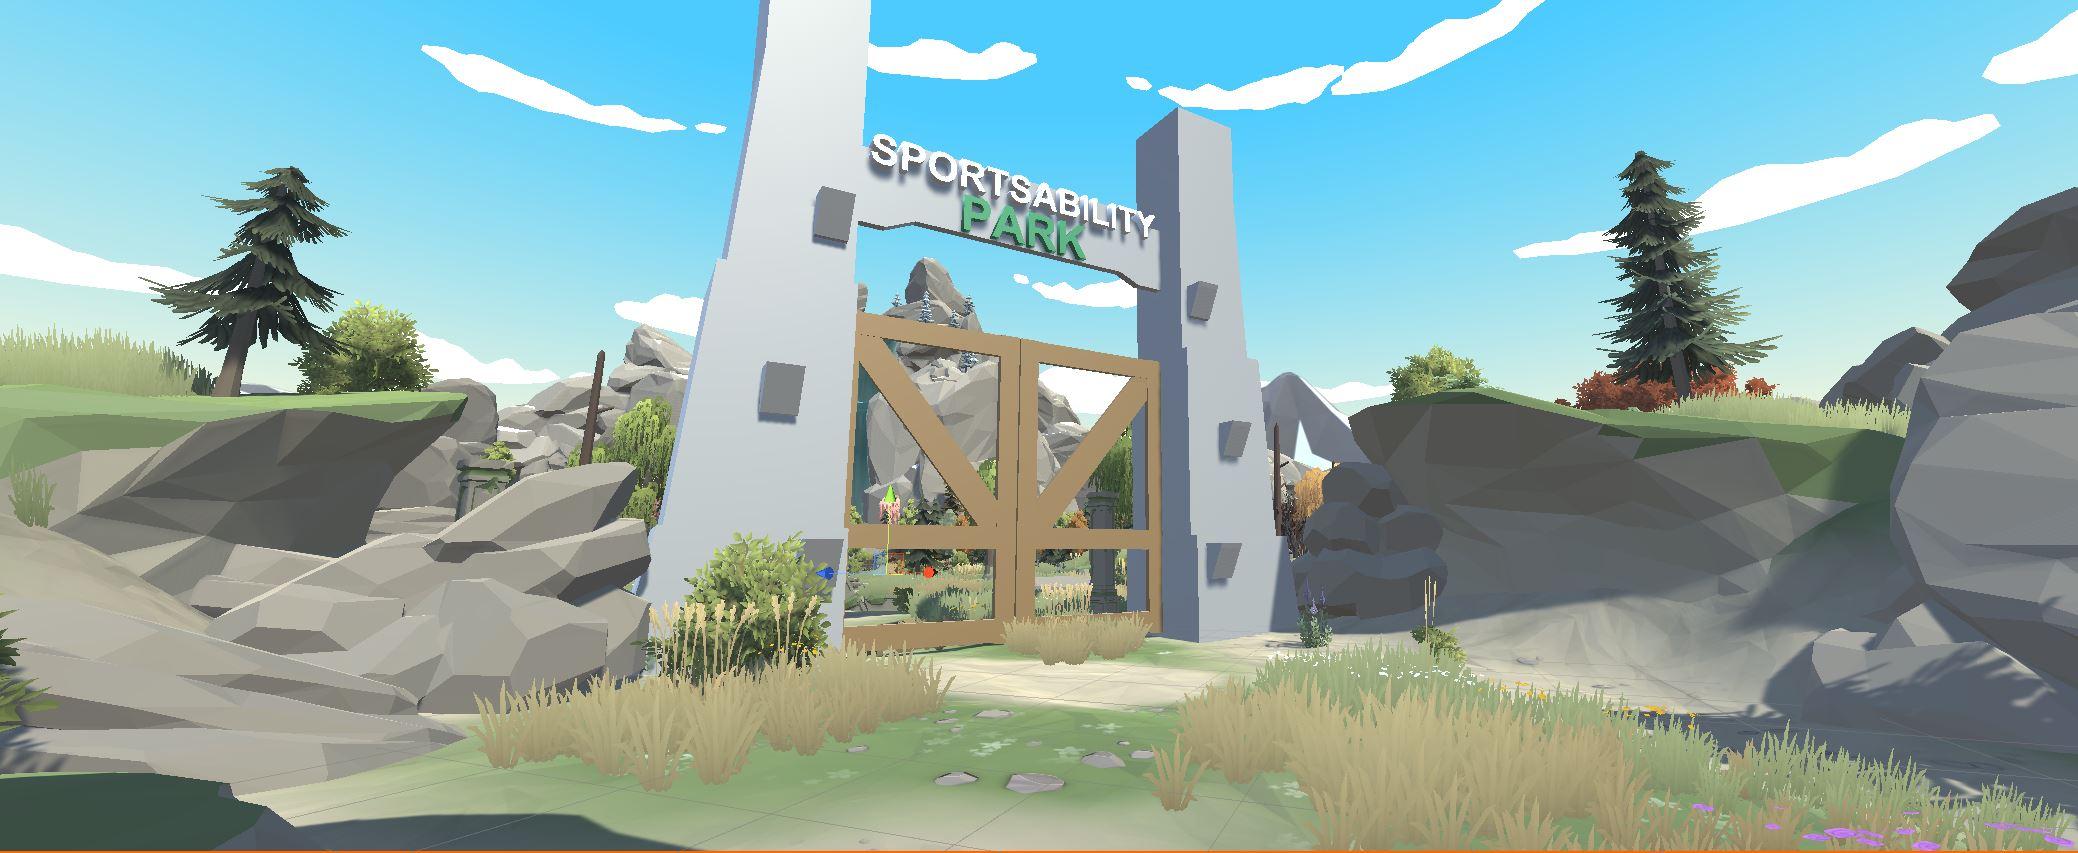 Image of SportsAbility VR Park entrance gate